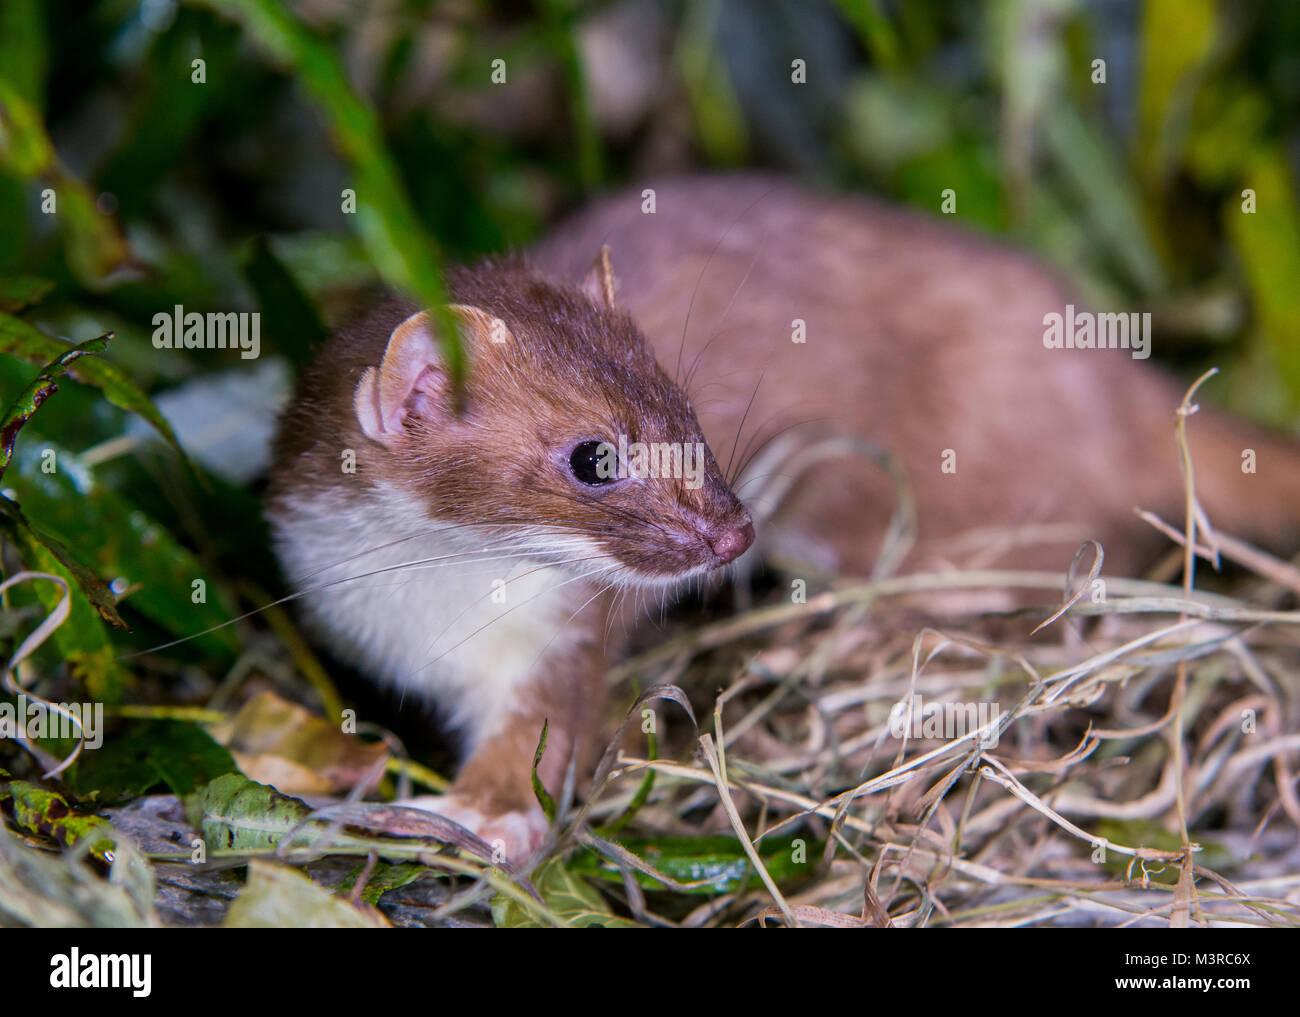 Weasel on rock looking upwards - Stock Image